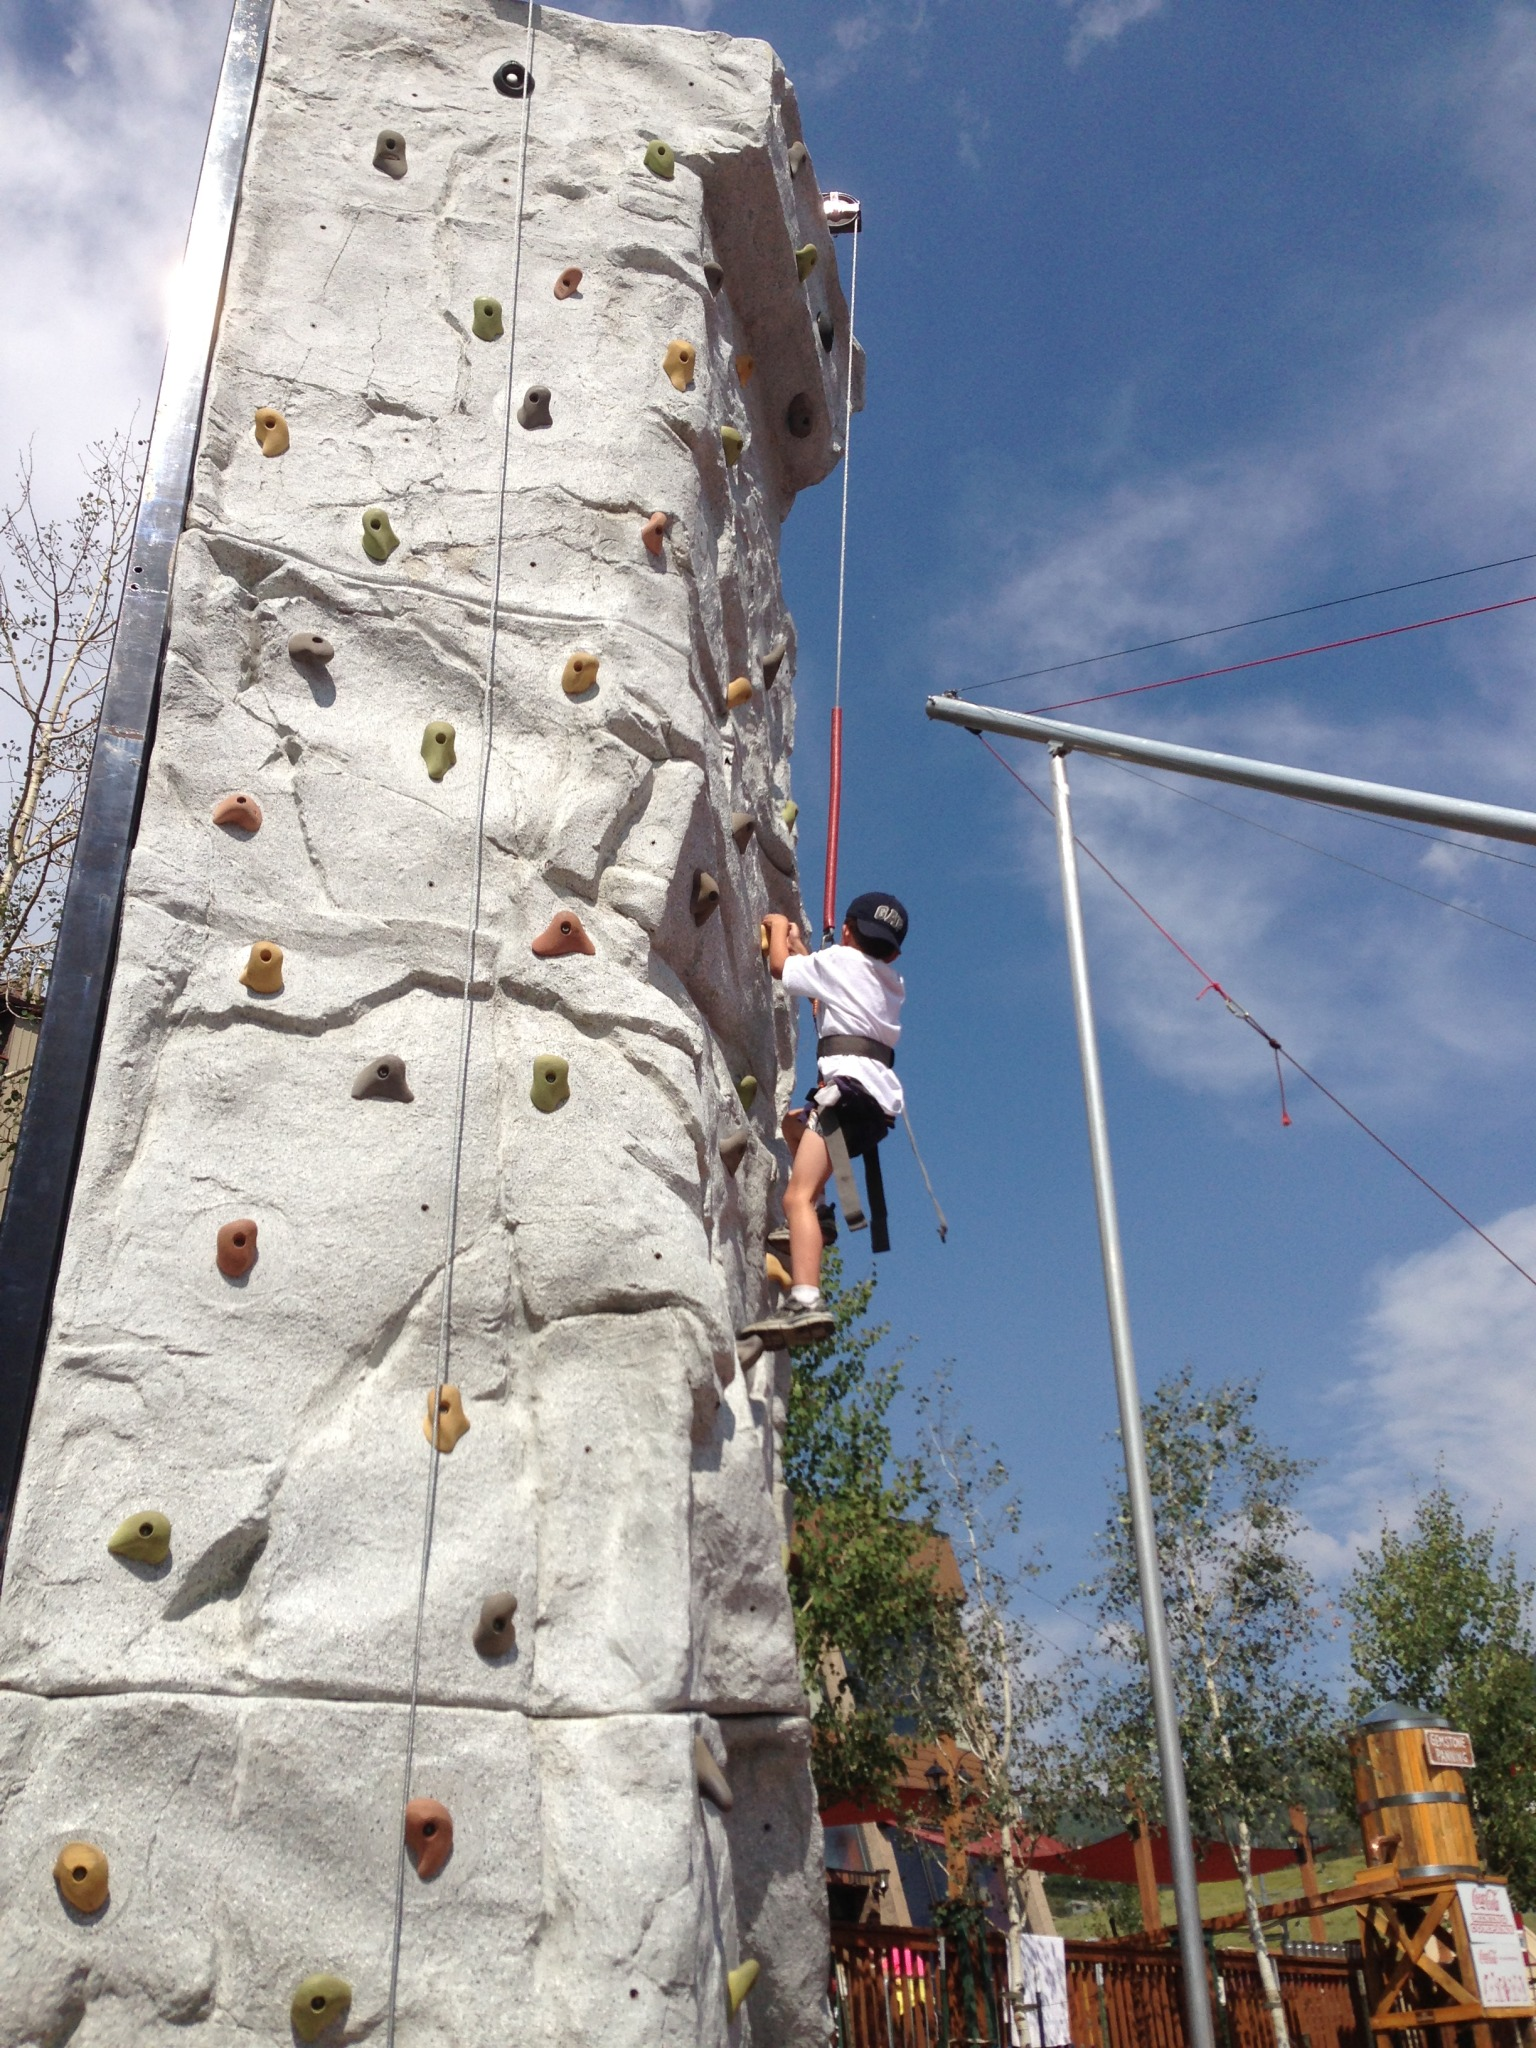 Nicholas the Tuna on the climbing wall